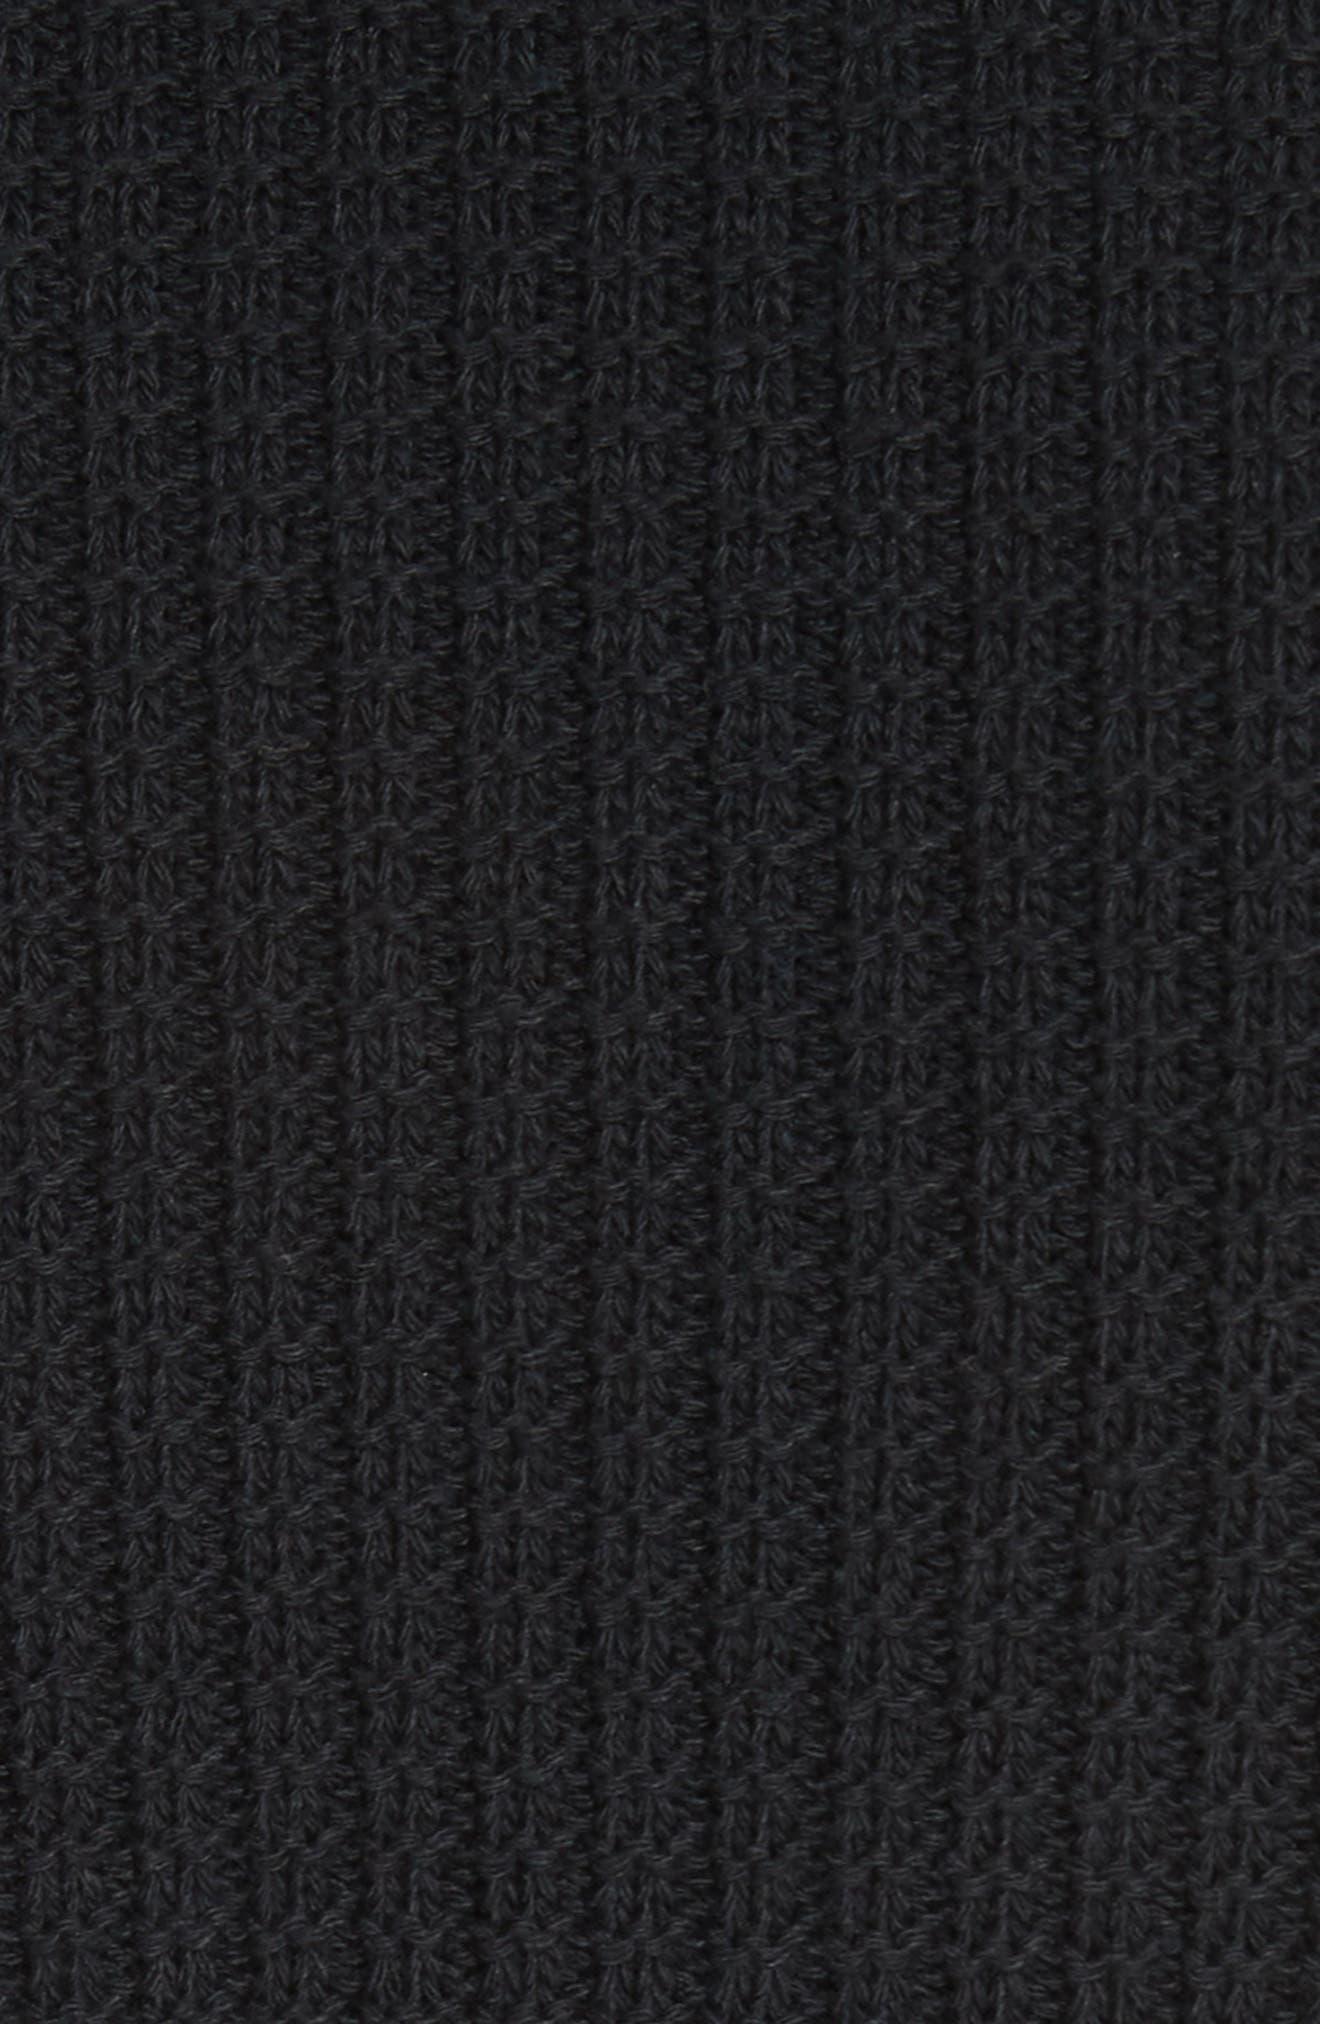 Barena Venzia Lione Badoer Knit Jacket,                             Alternate thumbnail 6, color,                             001